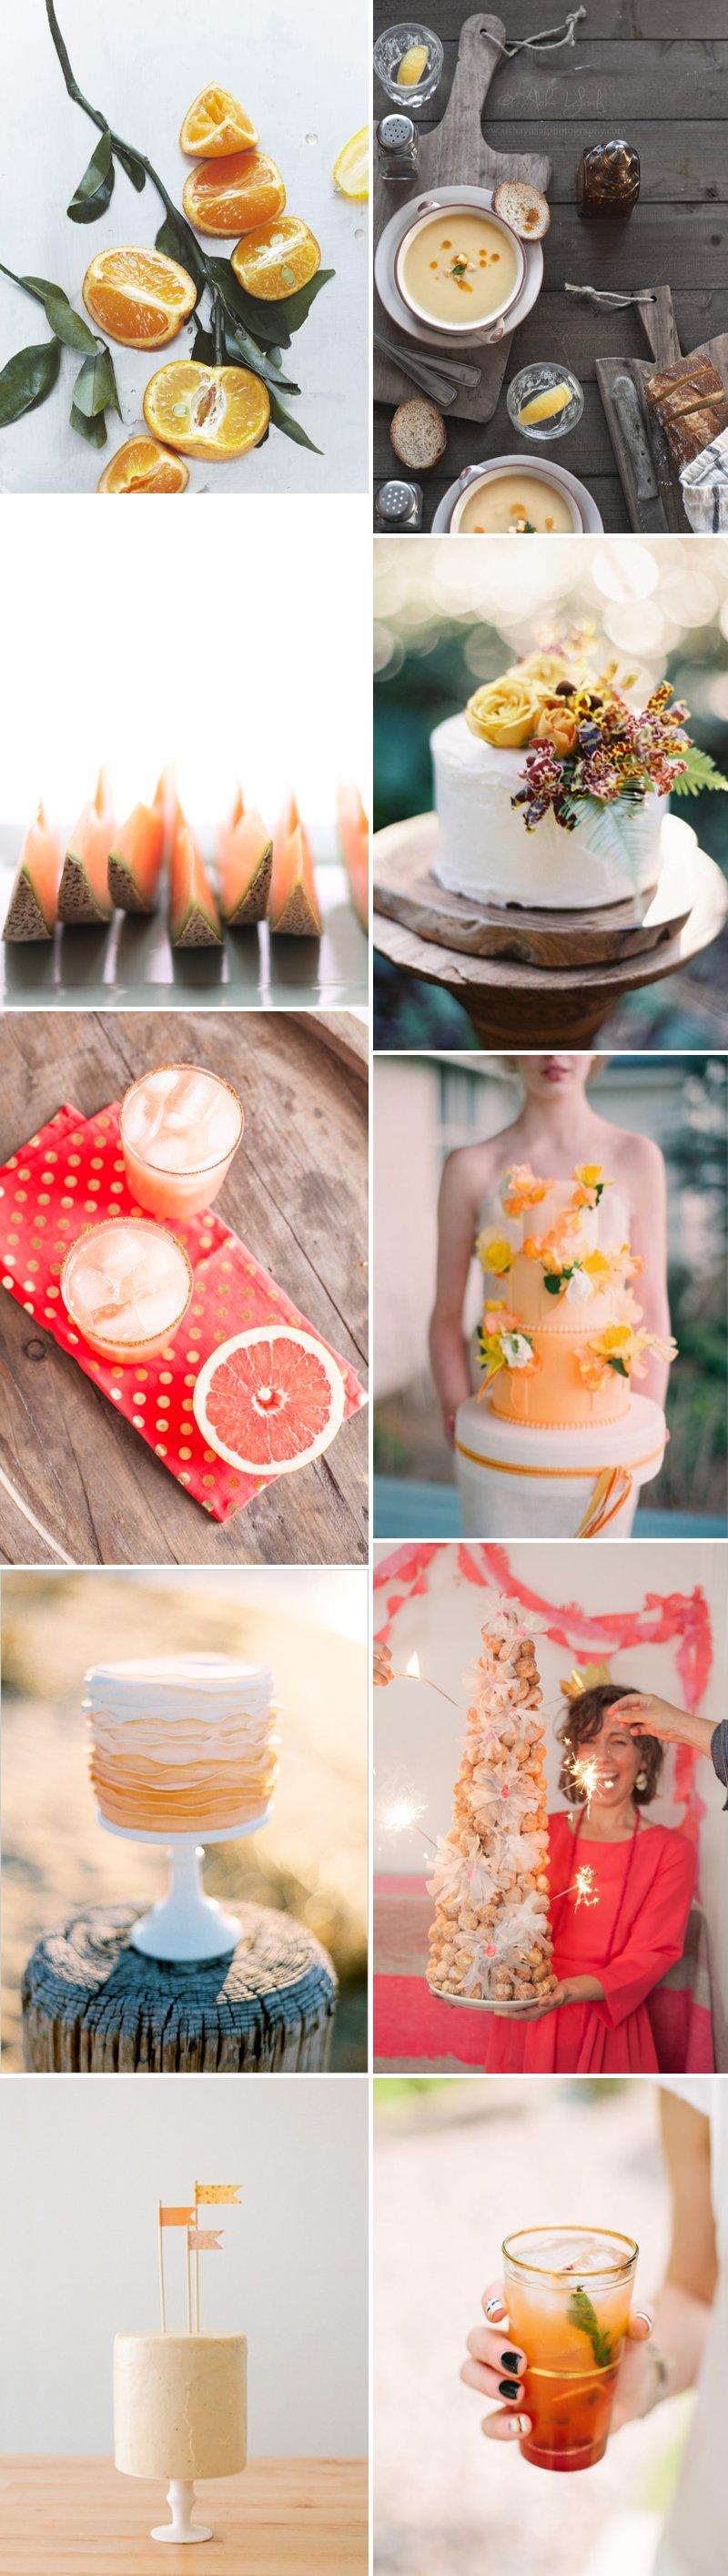 Orange Tangerine Blood Food Wedding Cake Cocktails